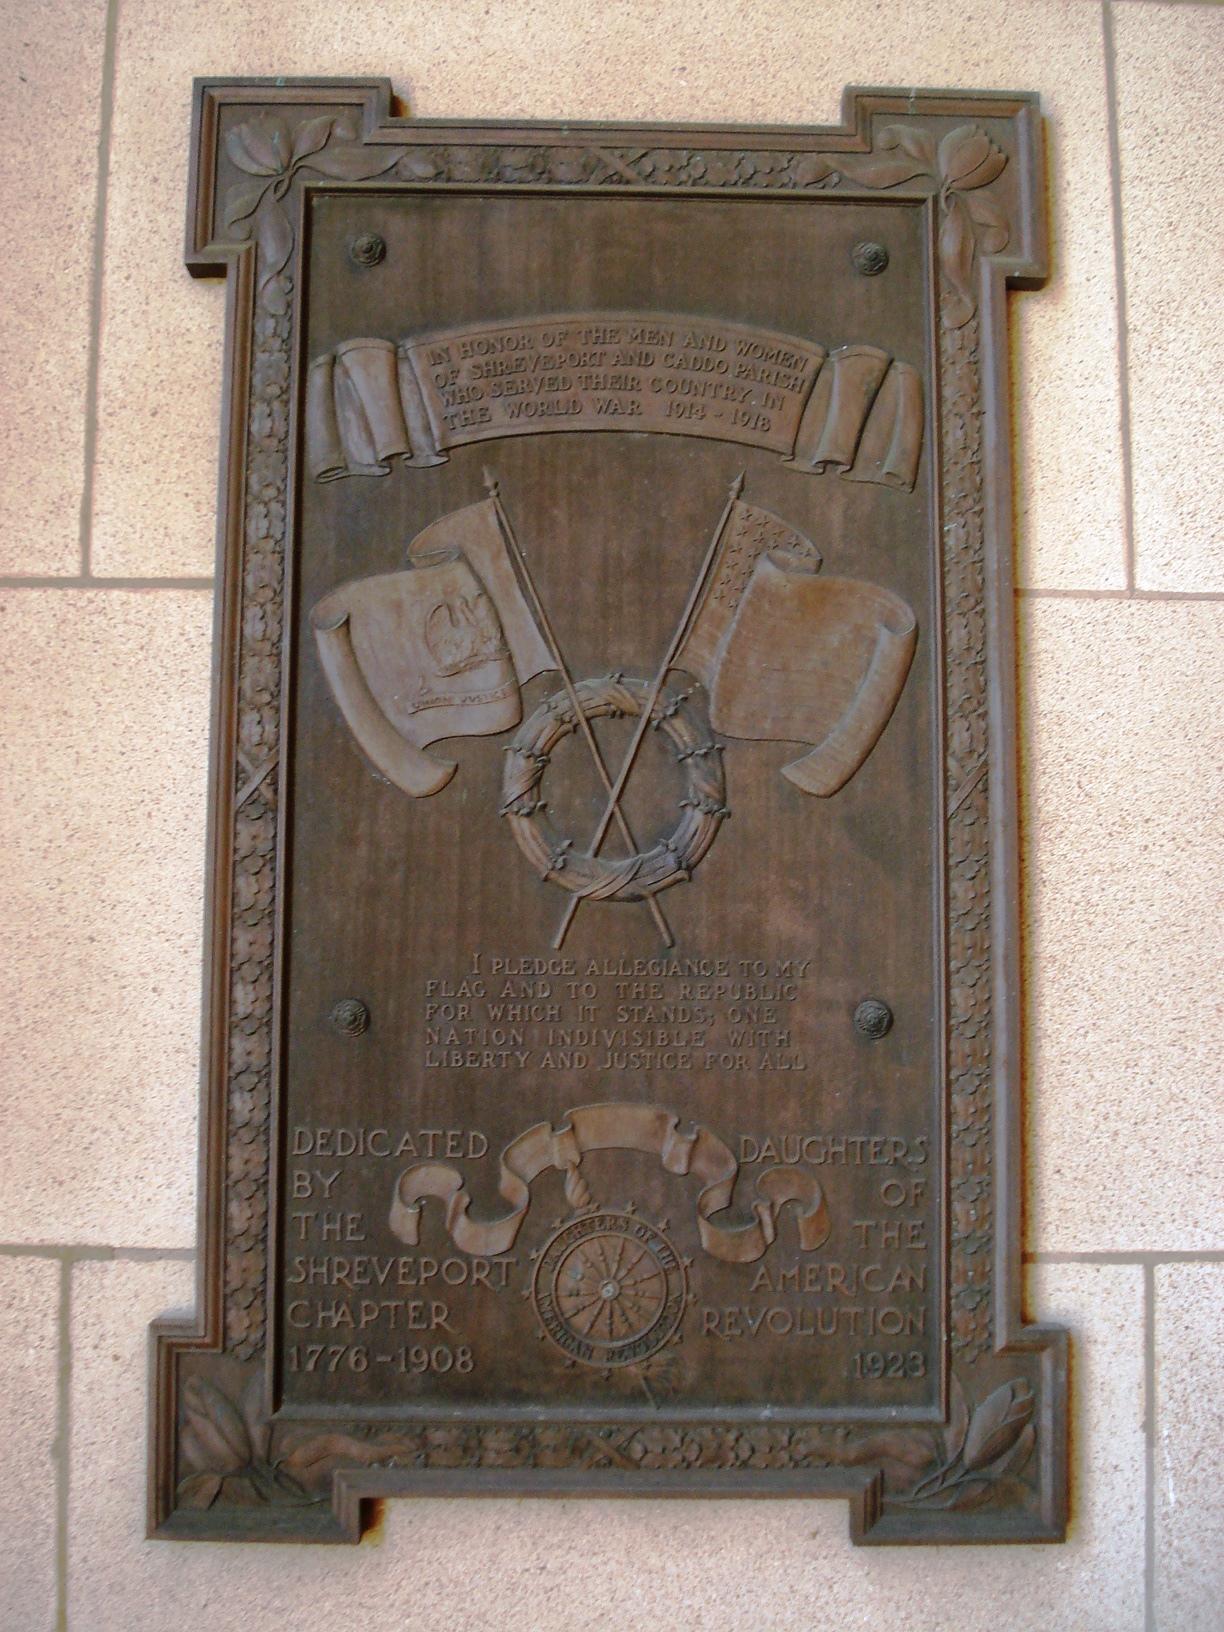 Shreveport World War I Memorial Plaque (LA)